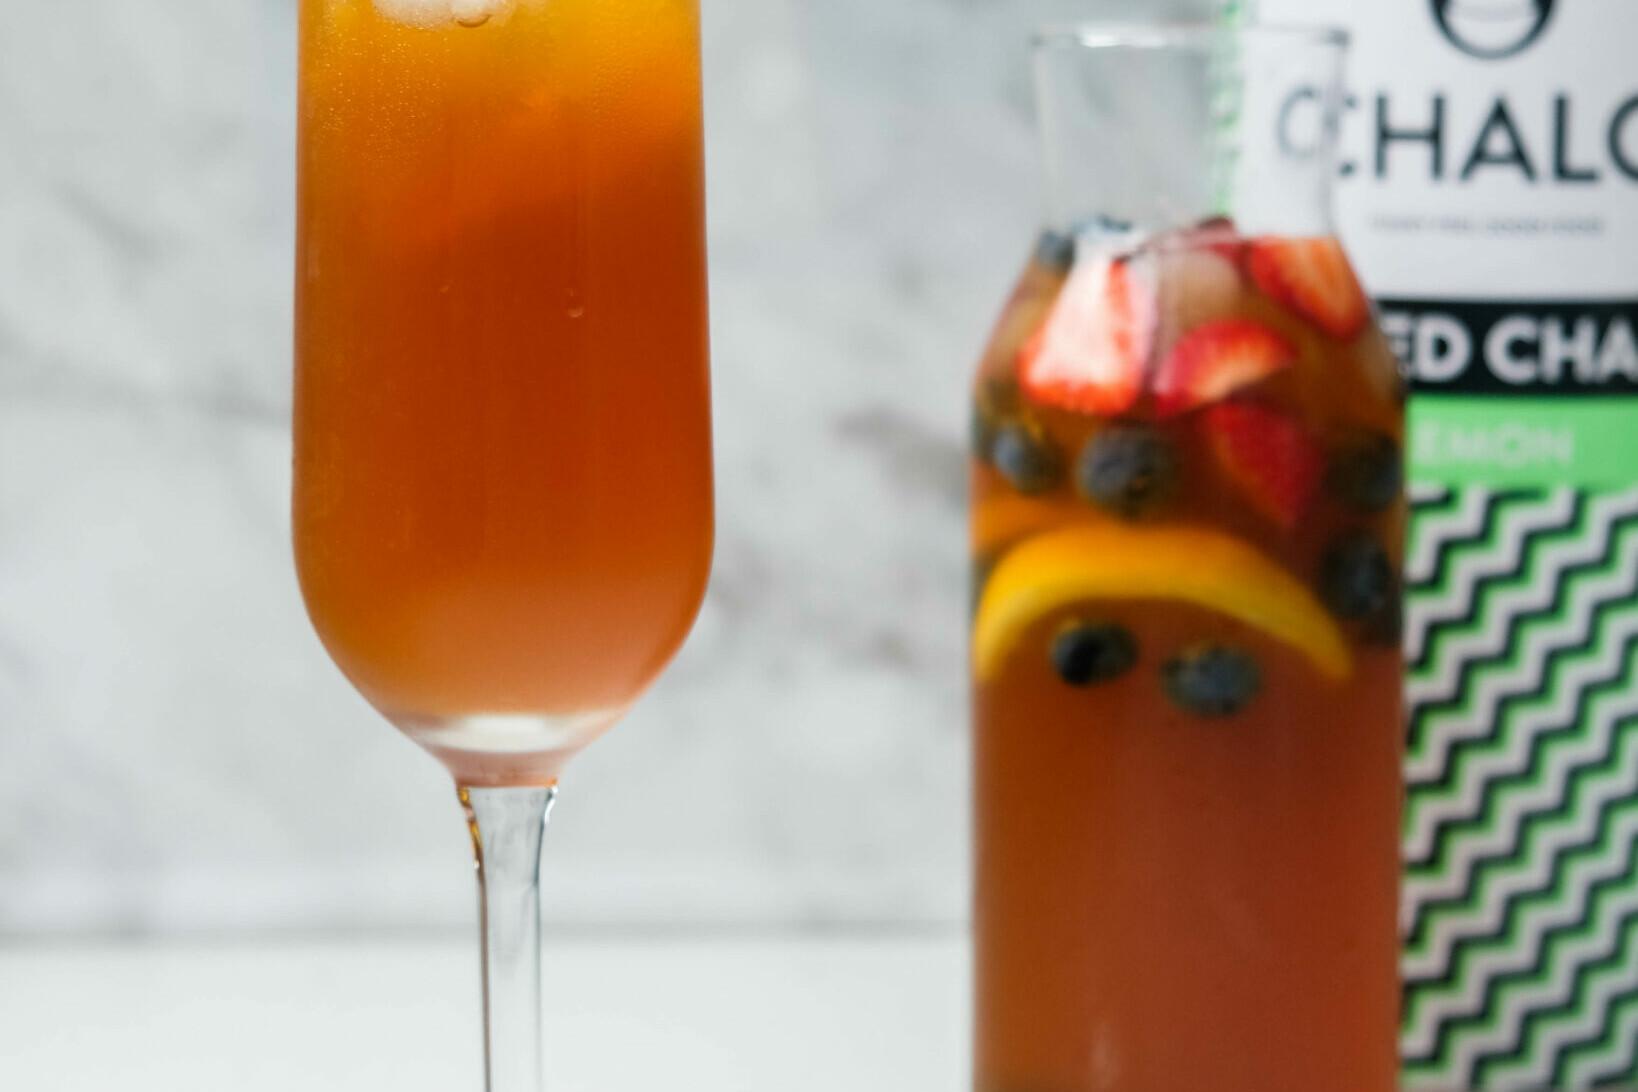 The Chalo Lemon Iced Chai Cocktail